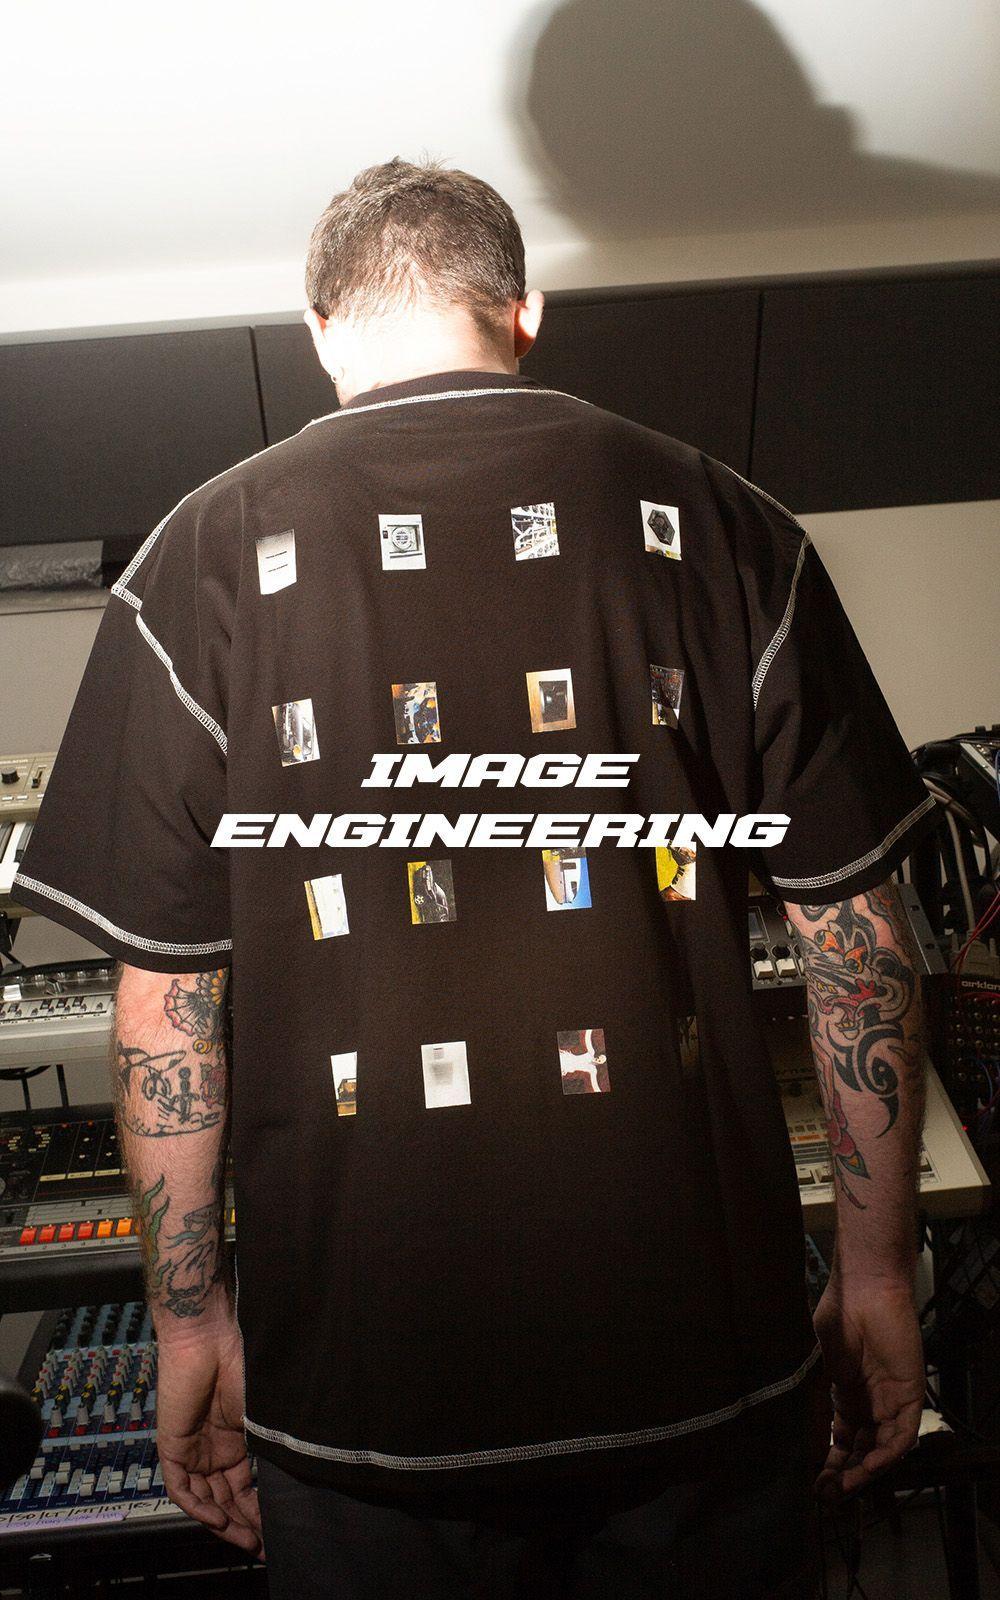 Image Engineering Fanzine Tee Micro-zine included.